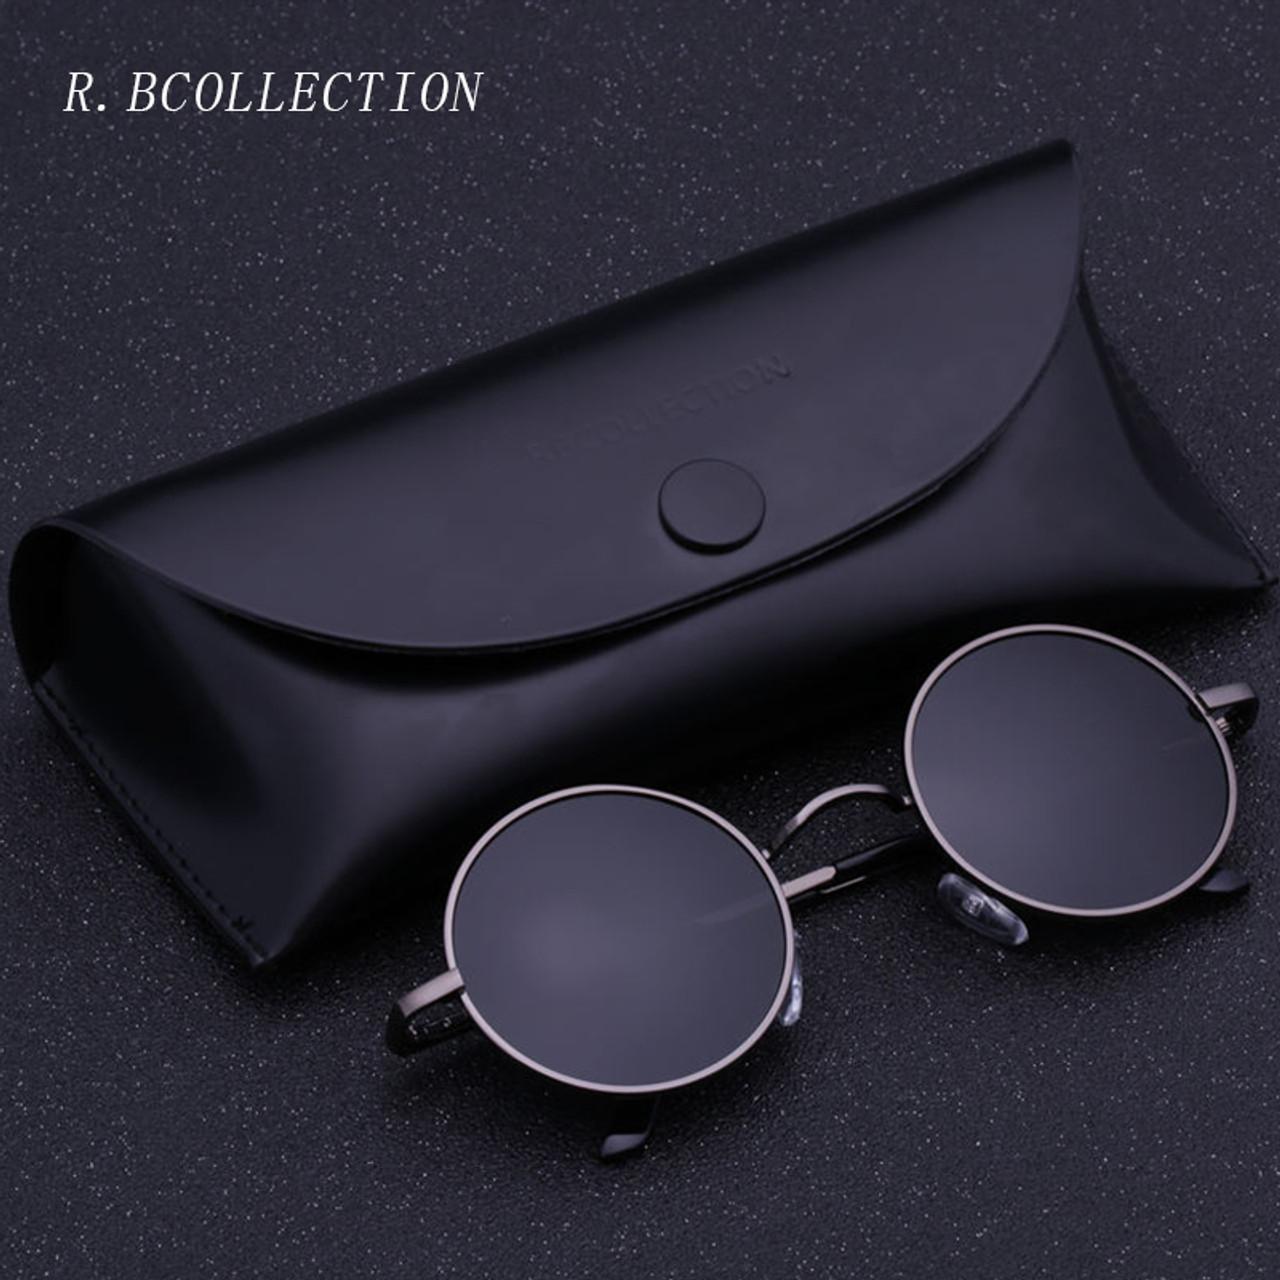 39c5aab34f ... R.BCOLLECTION Steampunk Round Sunglasses Men Women Anti-UV Polarized  Metal Frame Retro Sun ...